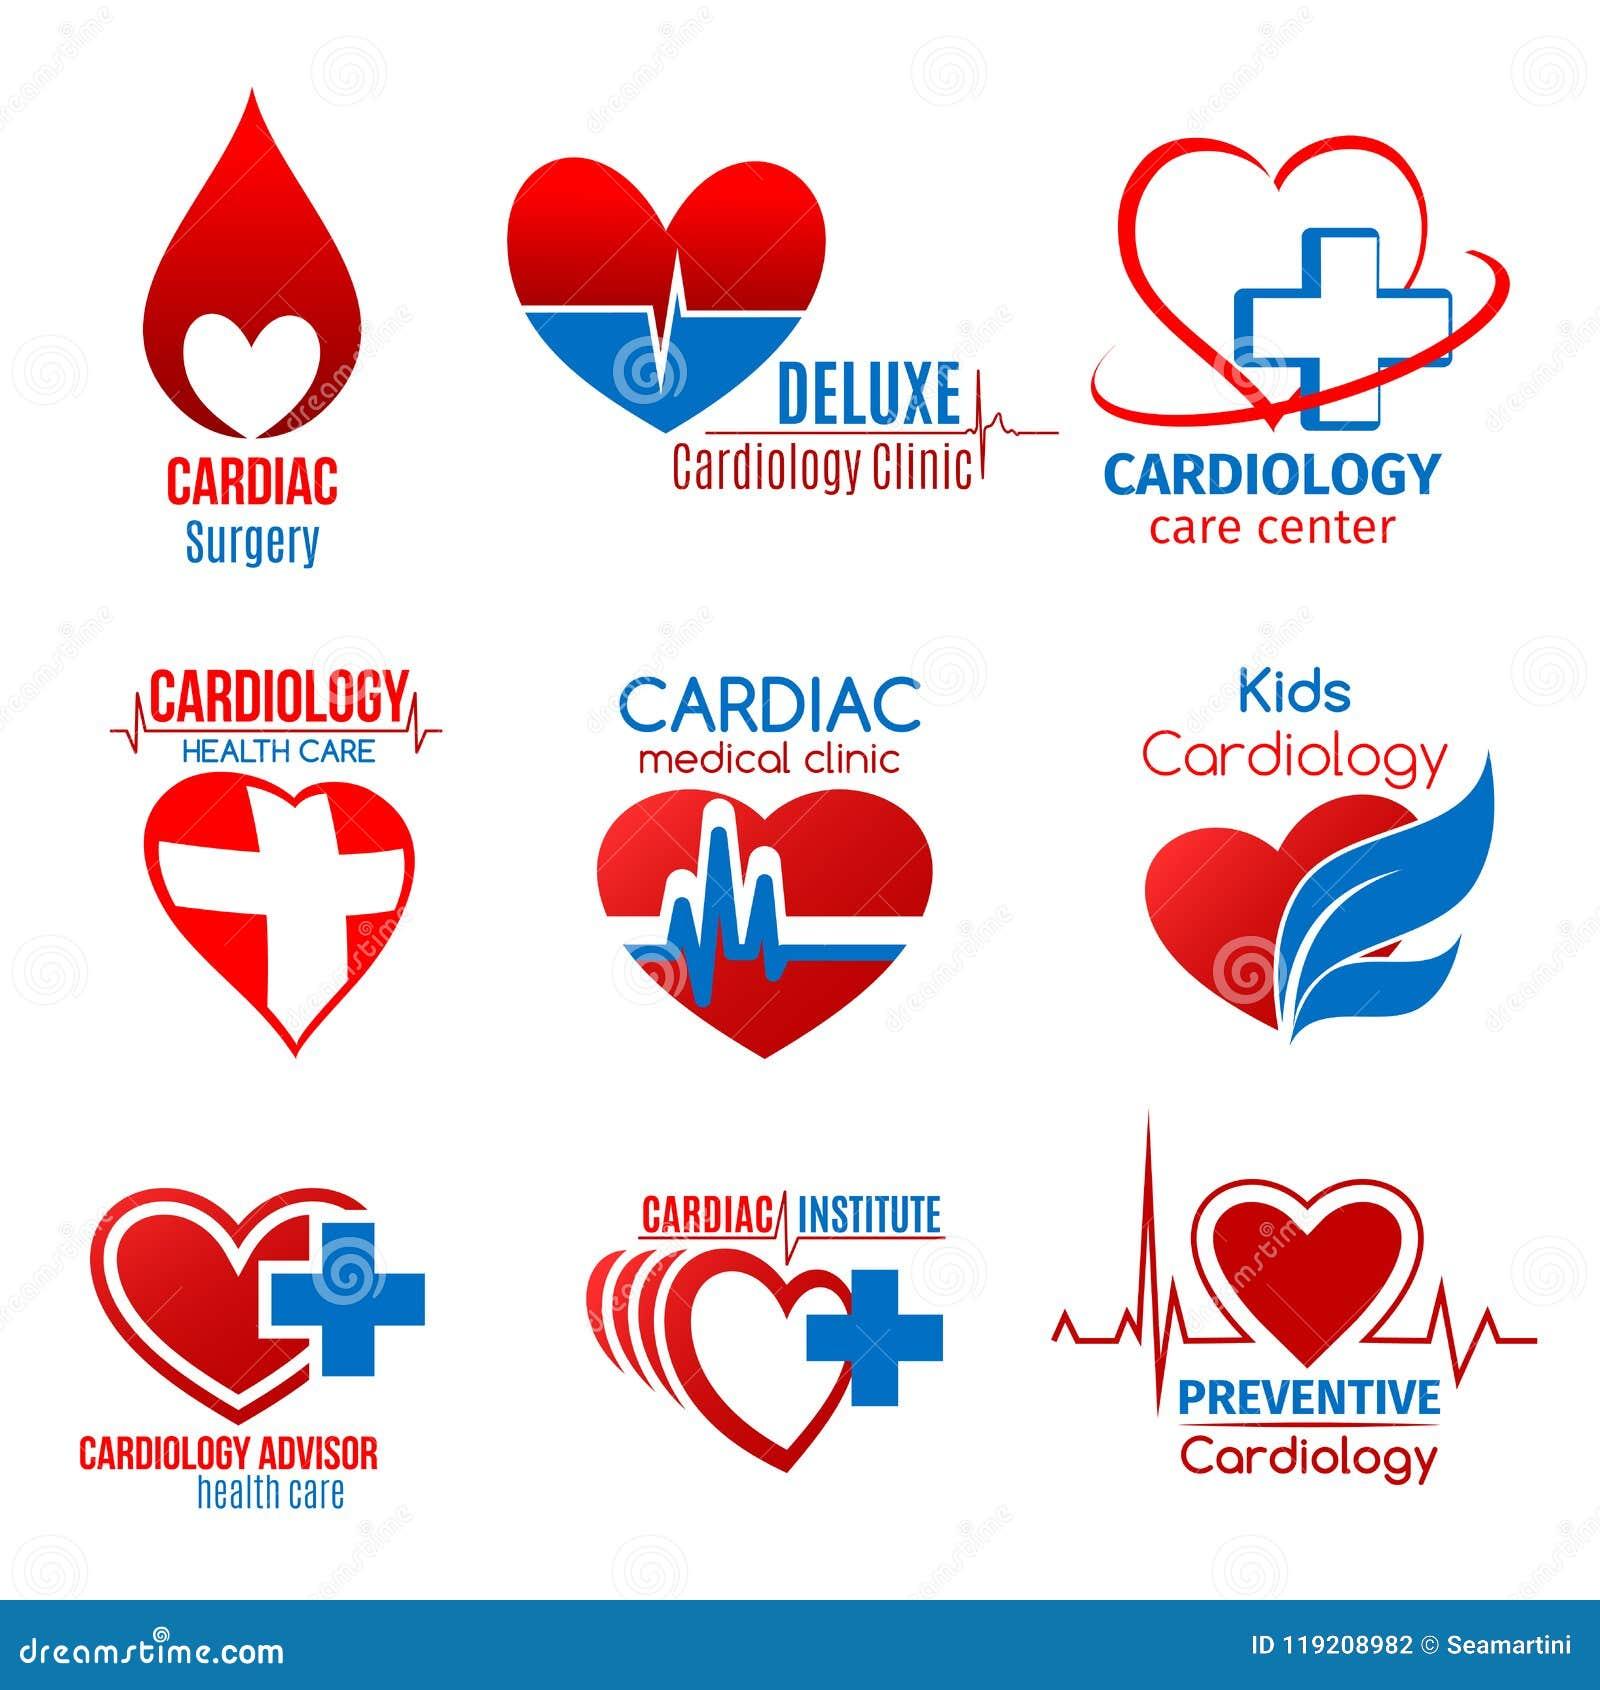 Cardiology Medicine And Cardiac Surgery Symbol Stock Vector Illustration Of Diagnosis Health 119208982